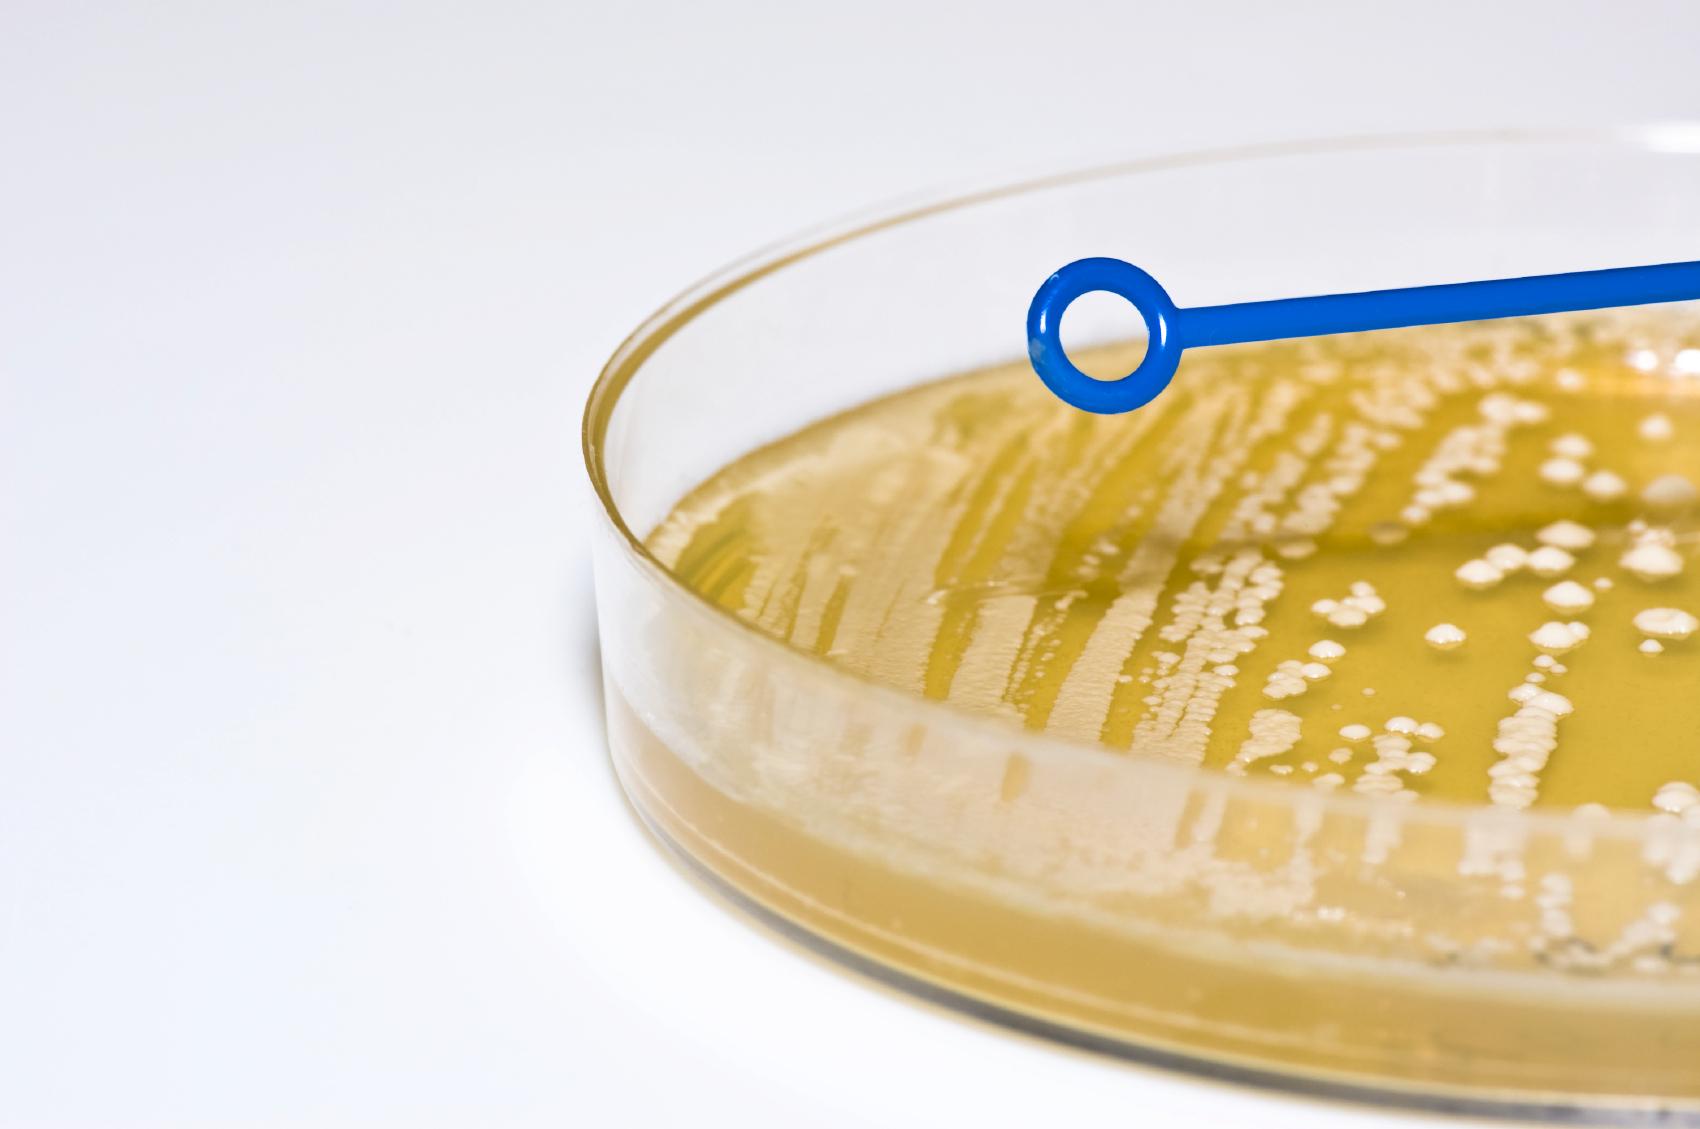 Bacterial_Plate